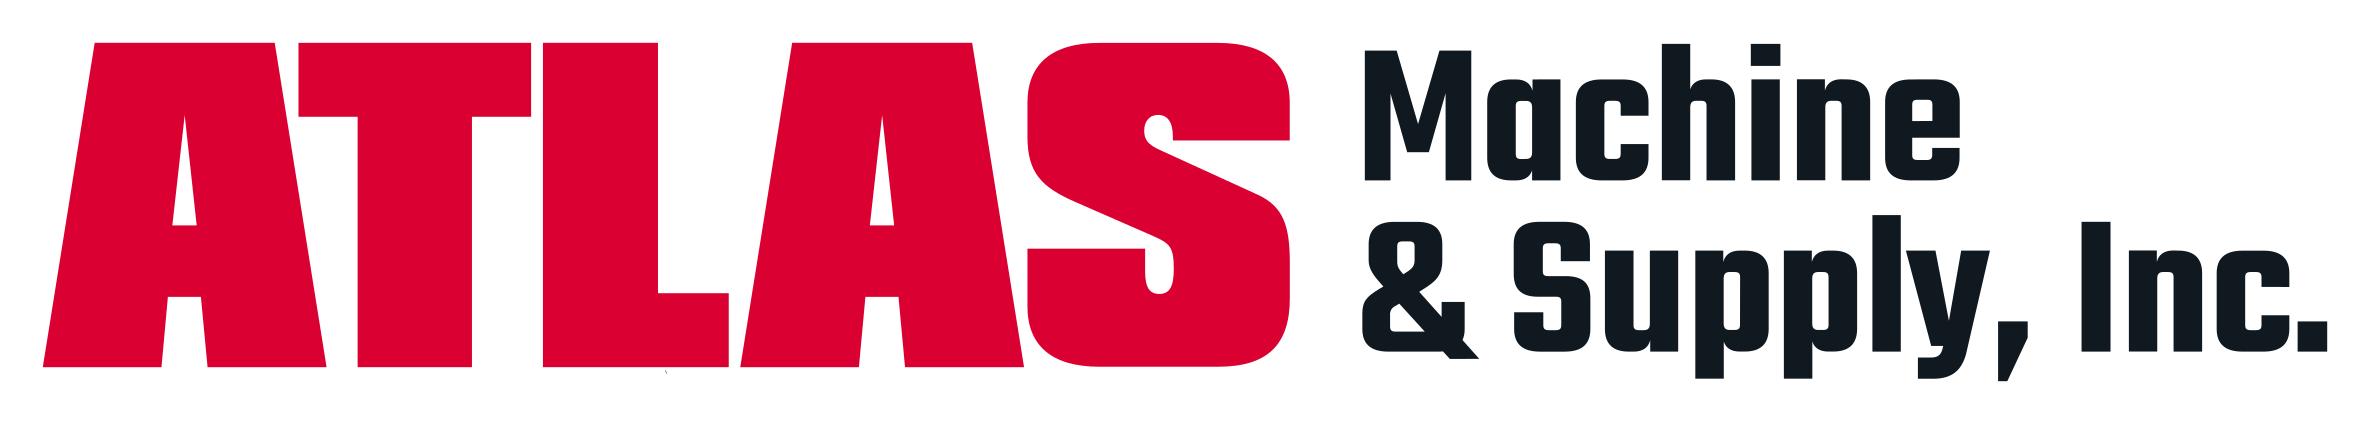 Atlas_Logotype_Horizontal